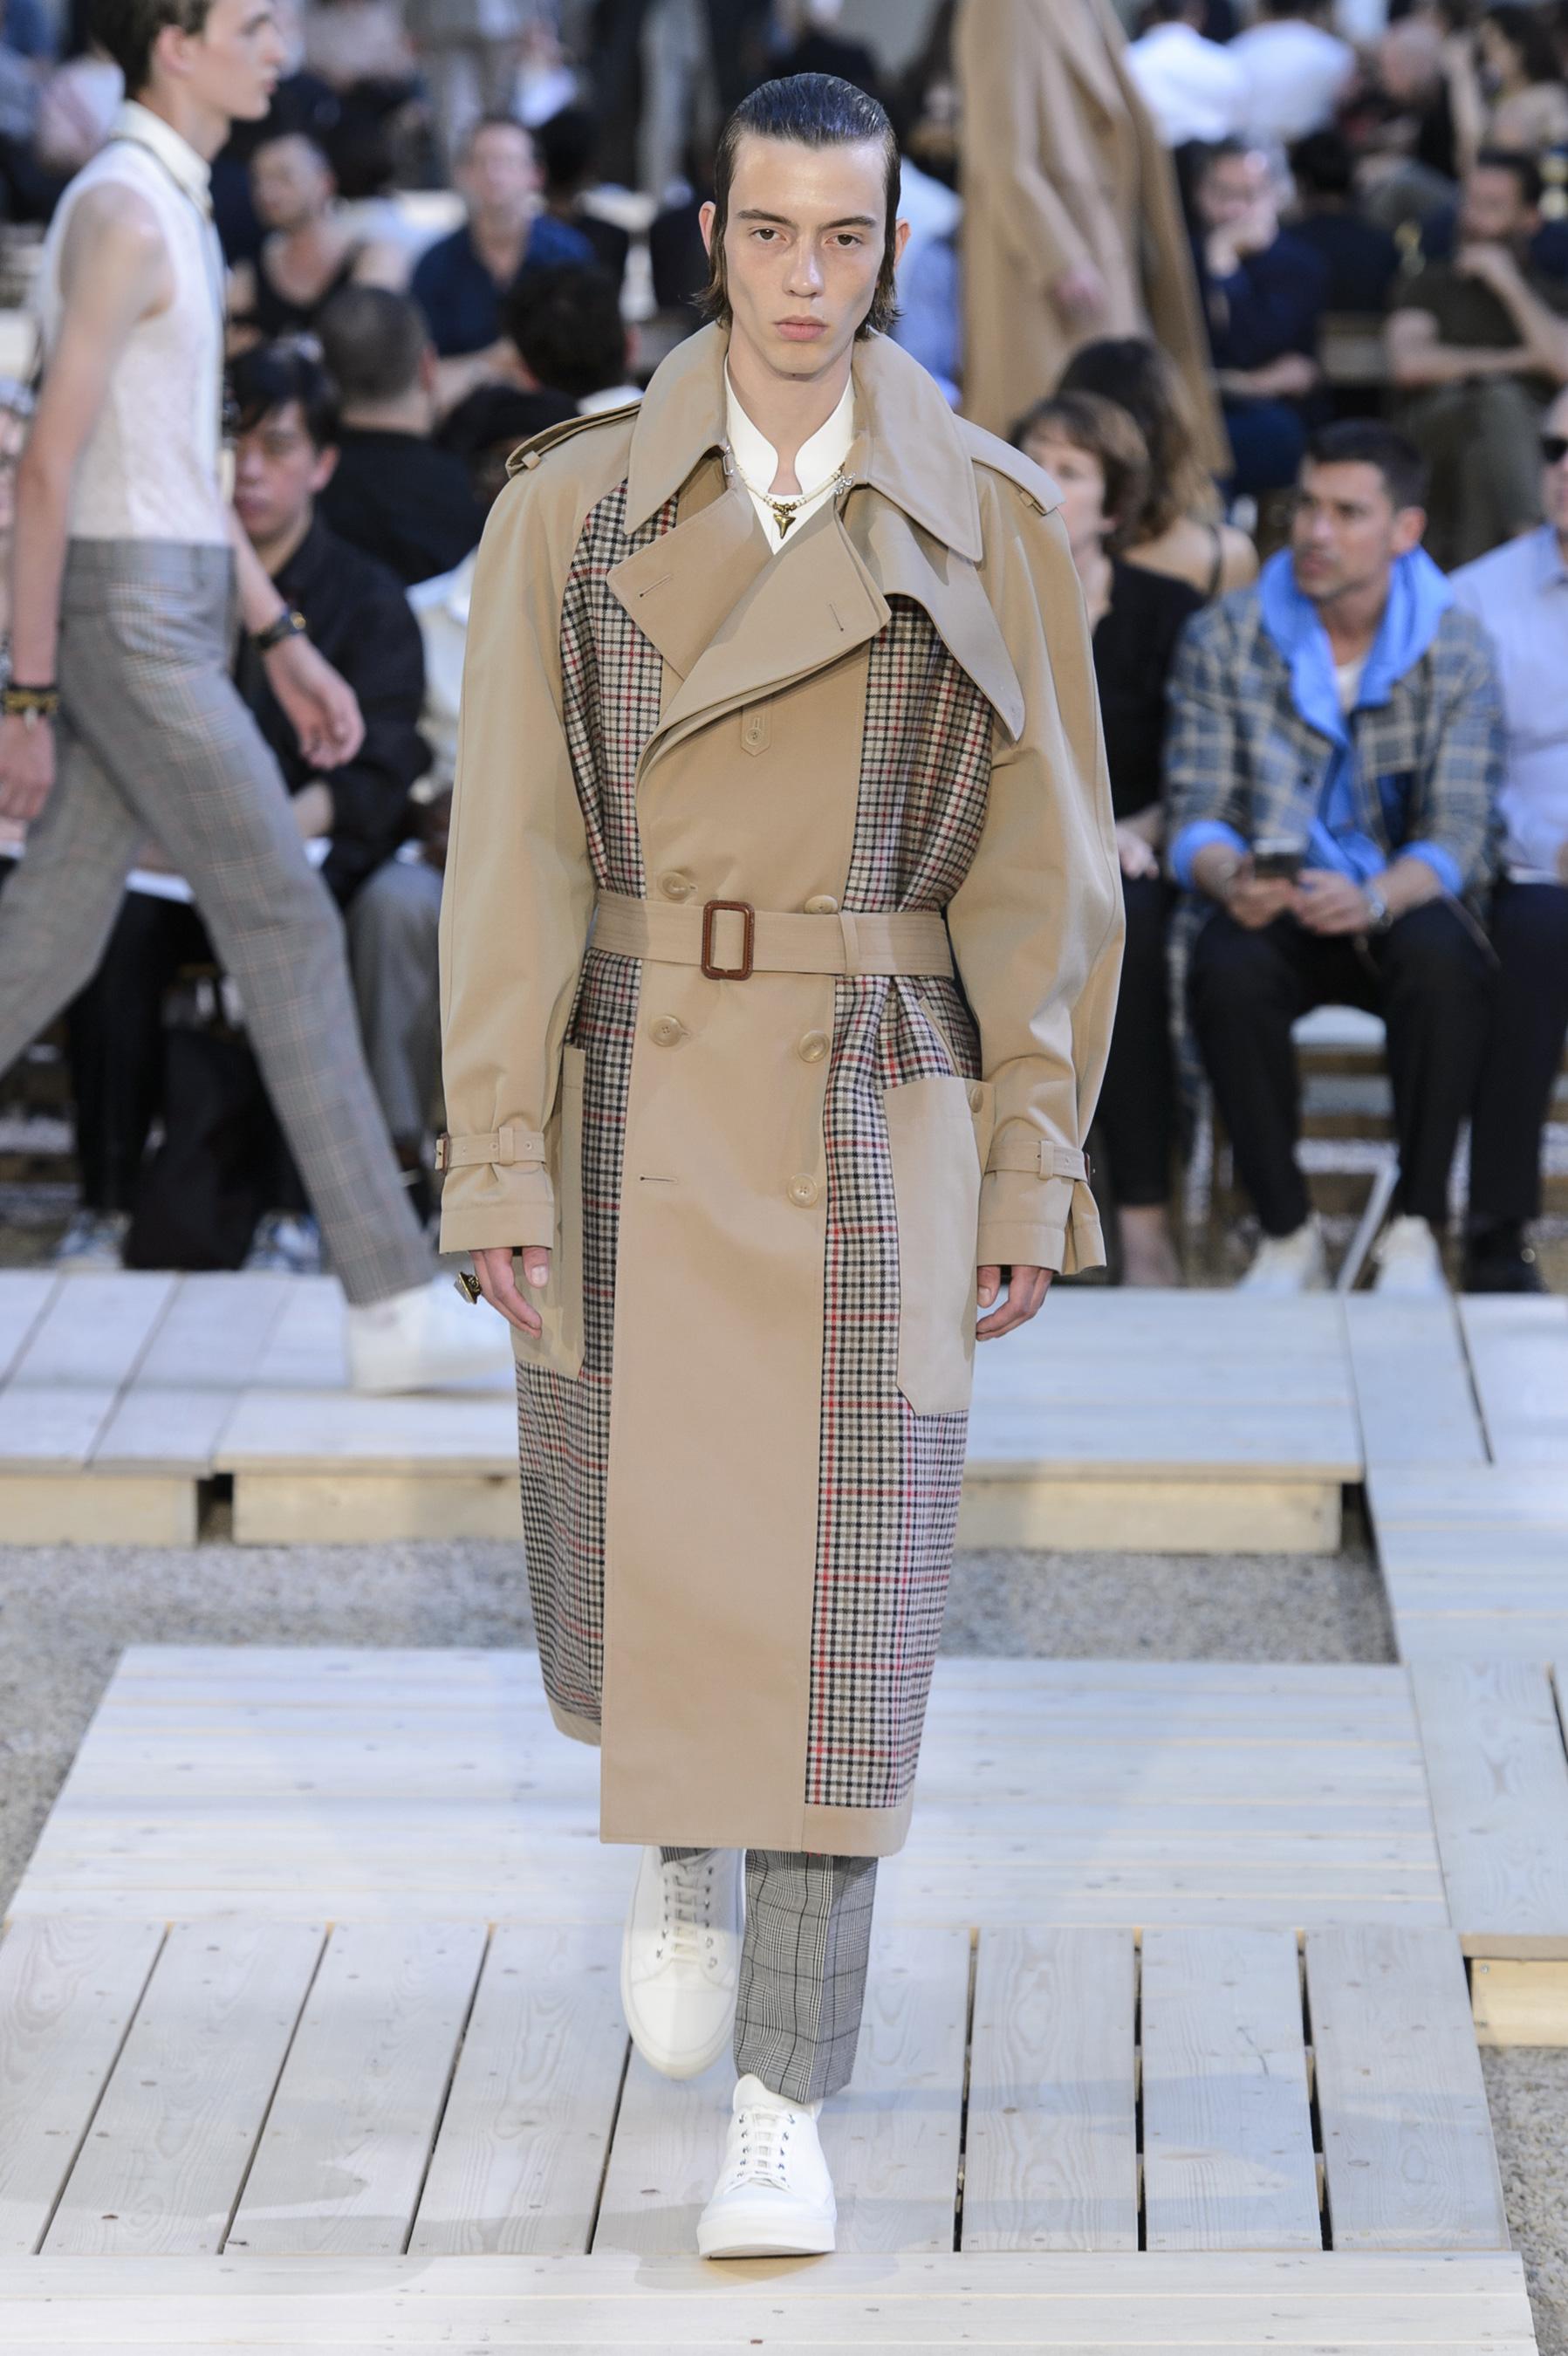 Alexander McQueen Spring 2018 Men's Fashion Show